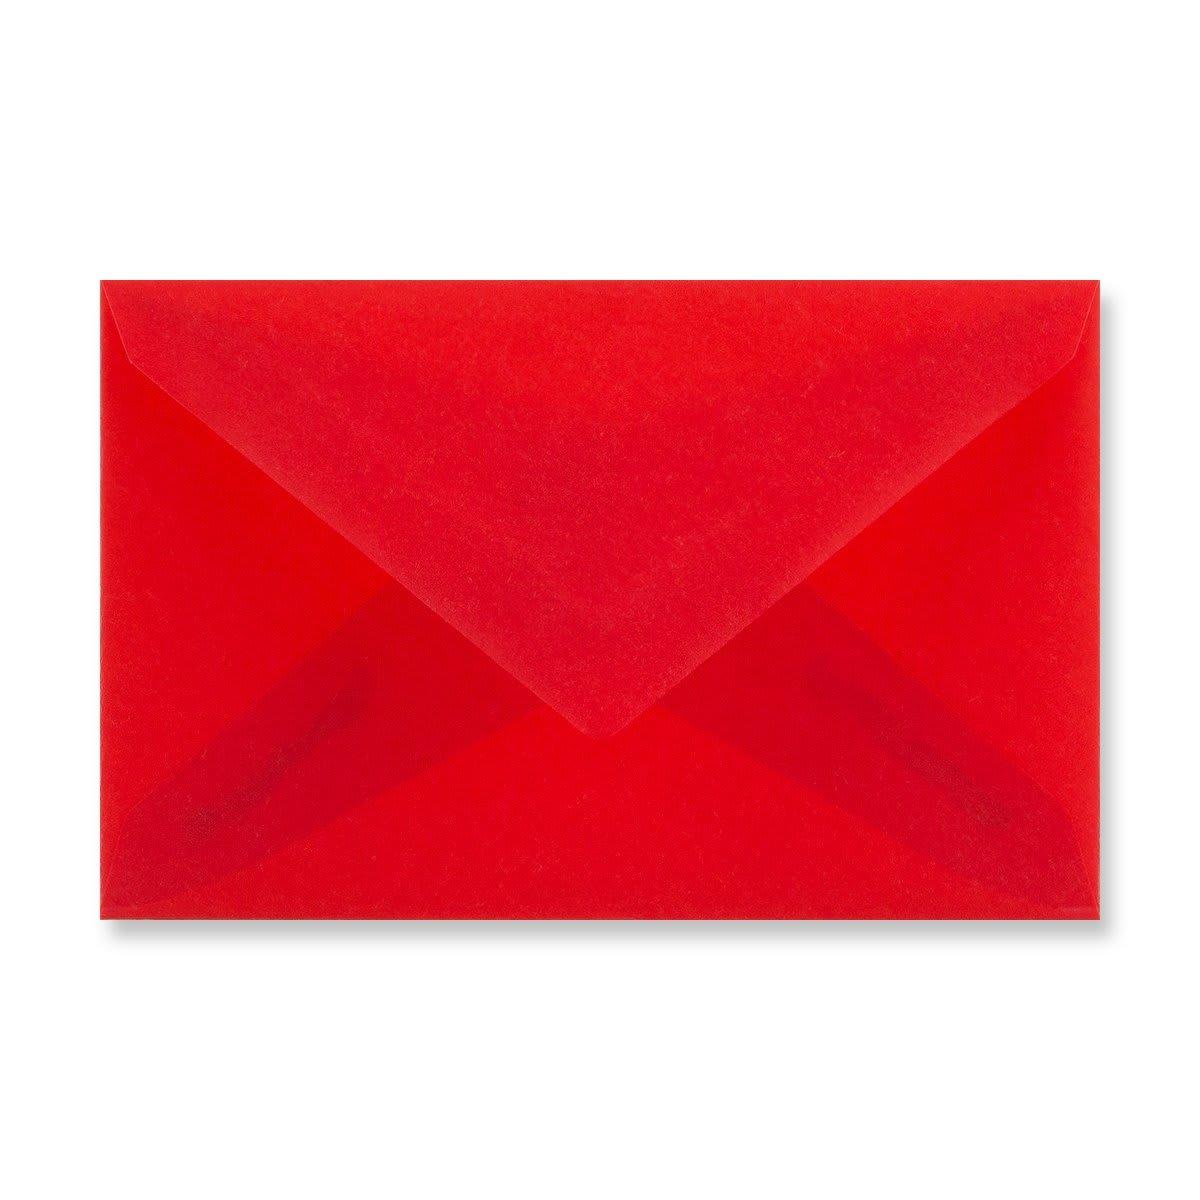 62 x 98MM RED TRANSLUCENT ENVELOPES